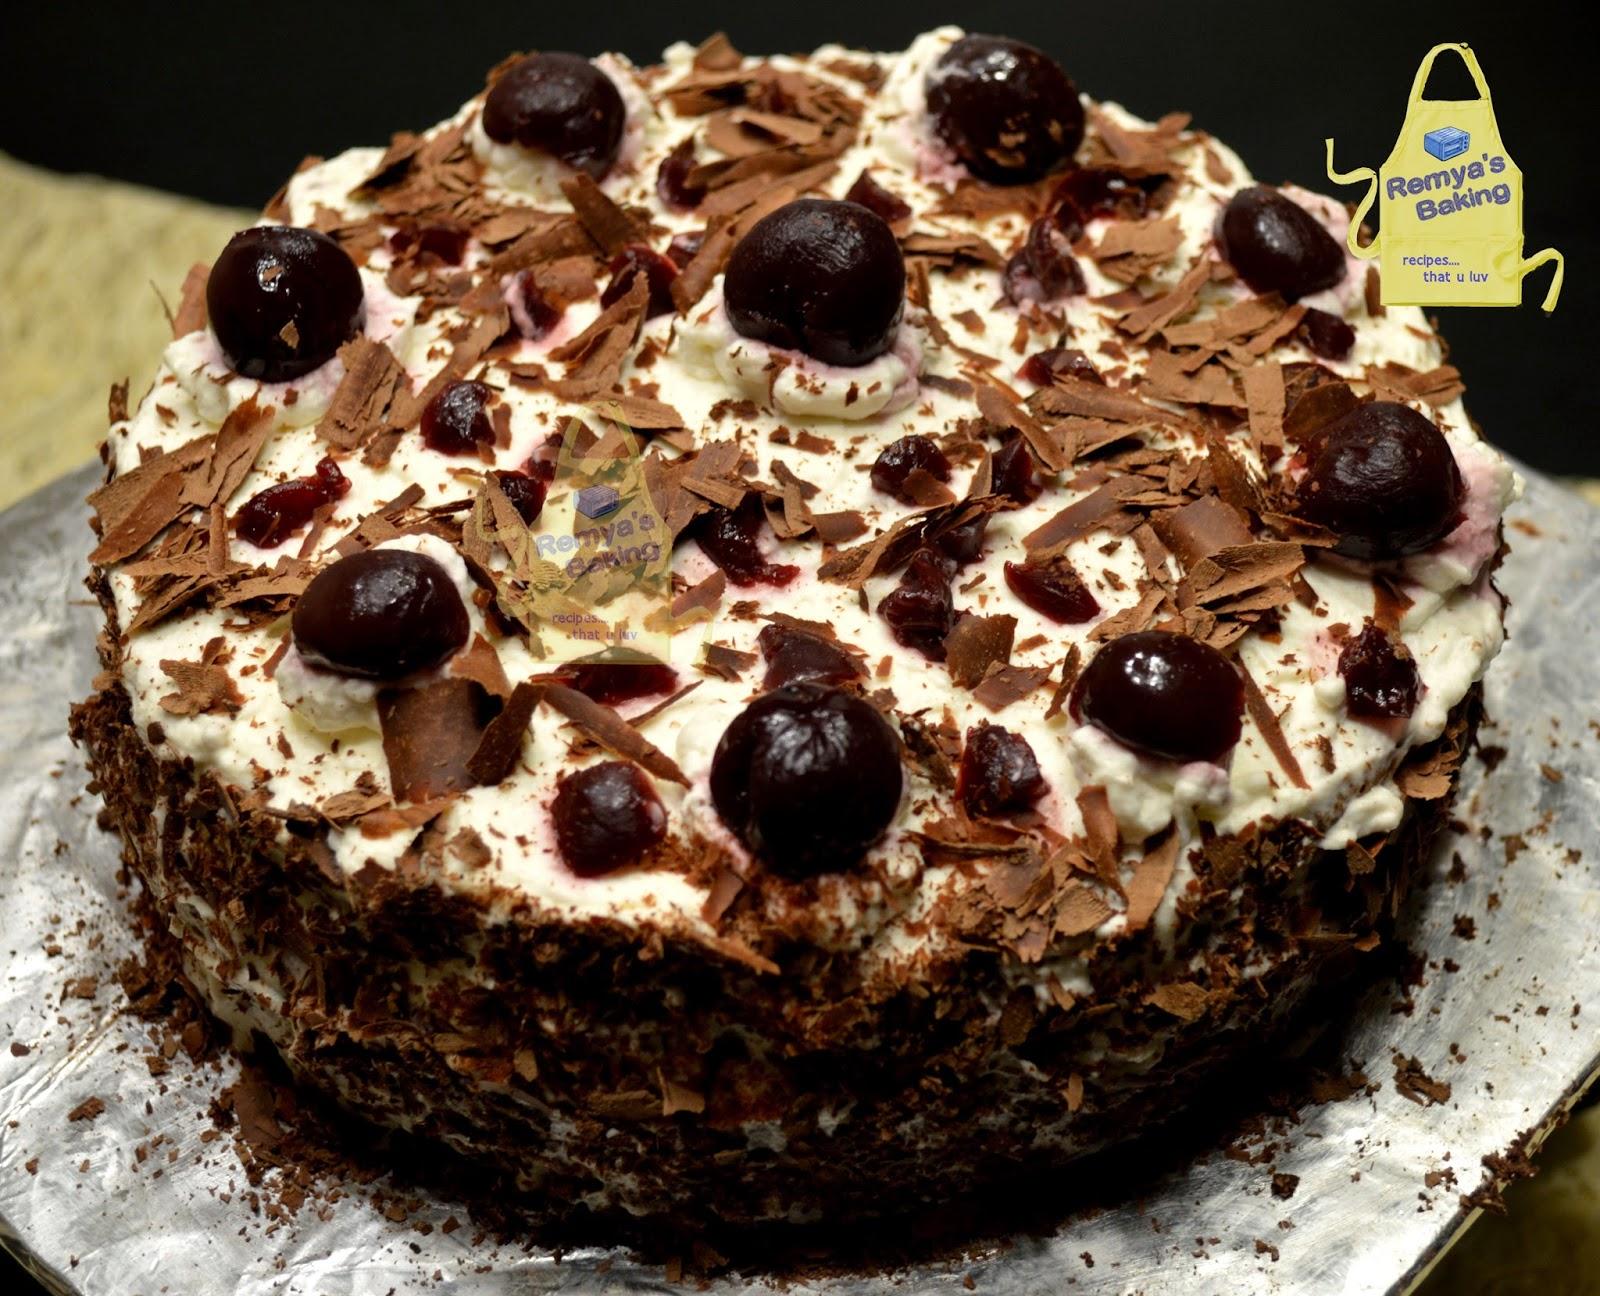 Black Forest Cake Ingredients In Grams